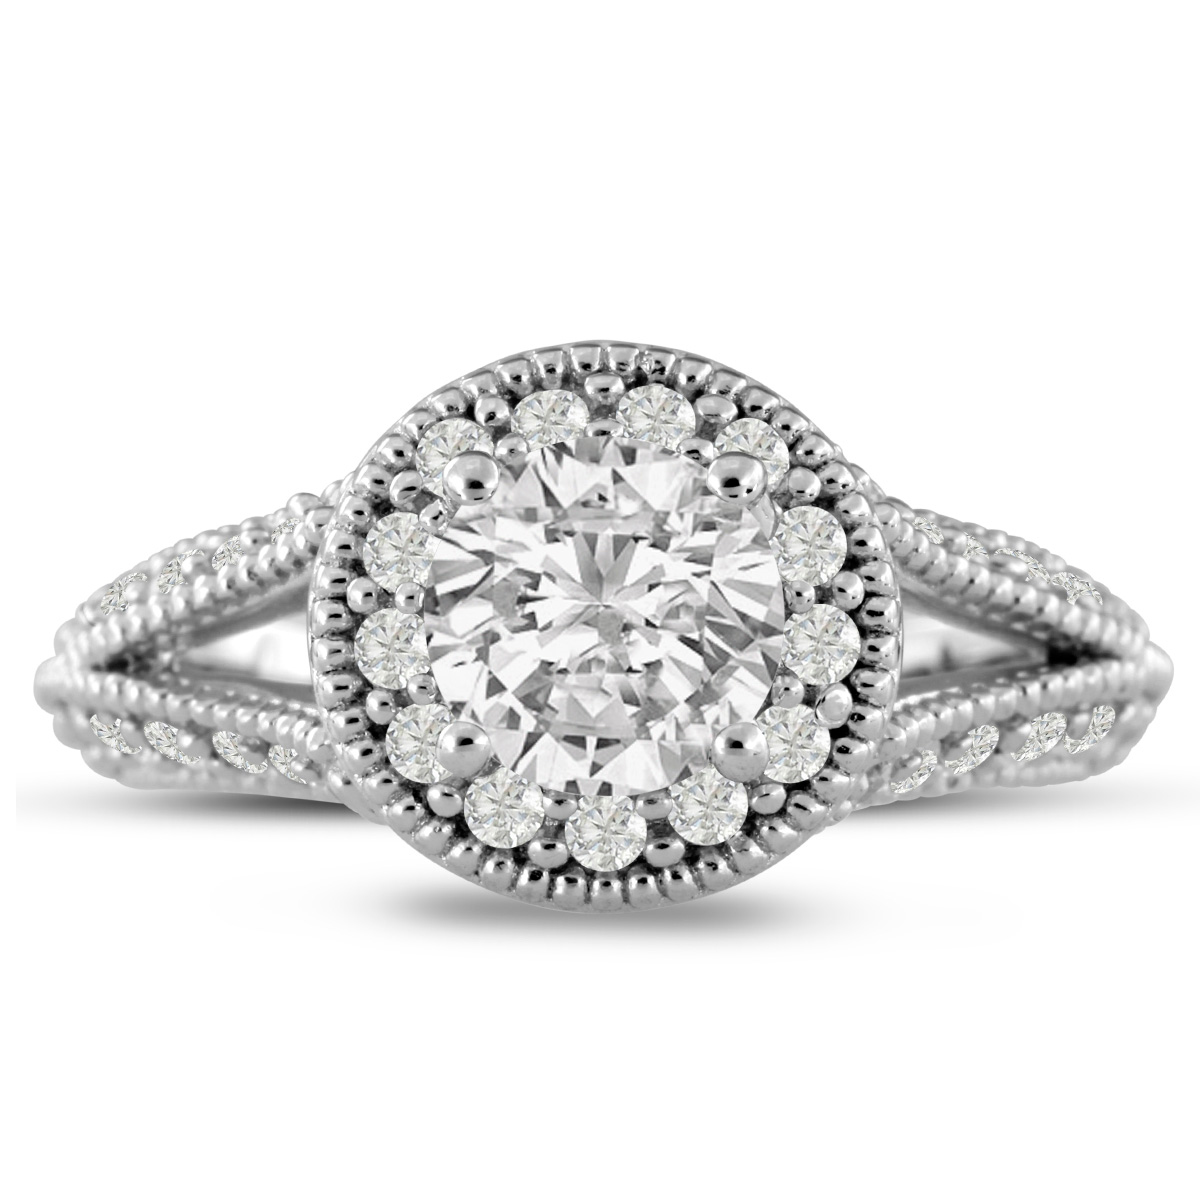 1 3/4 Carat Split Shank Halo Diamond Engagement Ring in 14K White